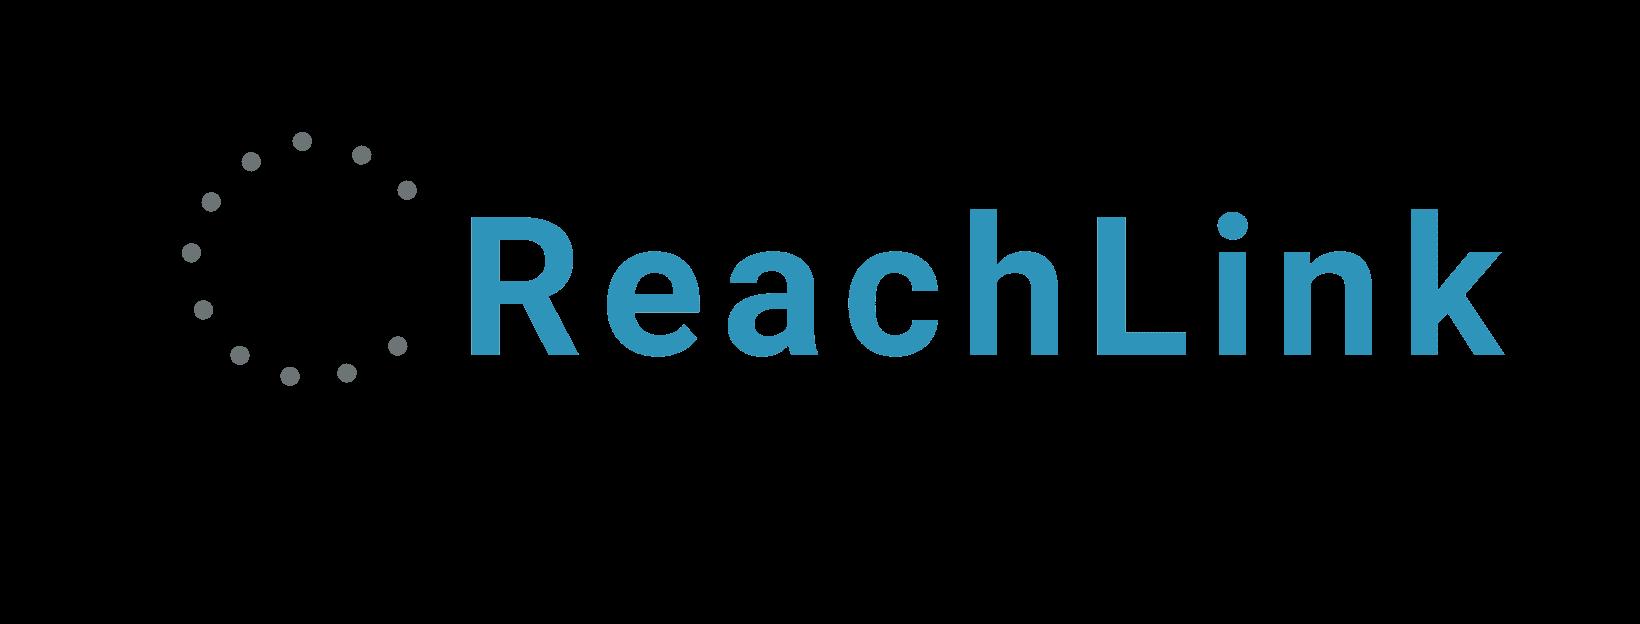 ReachLink Logo.